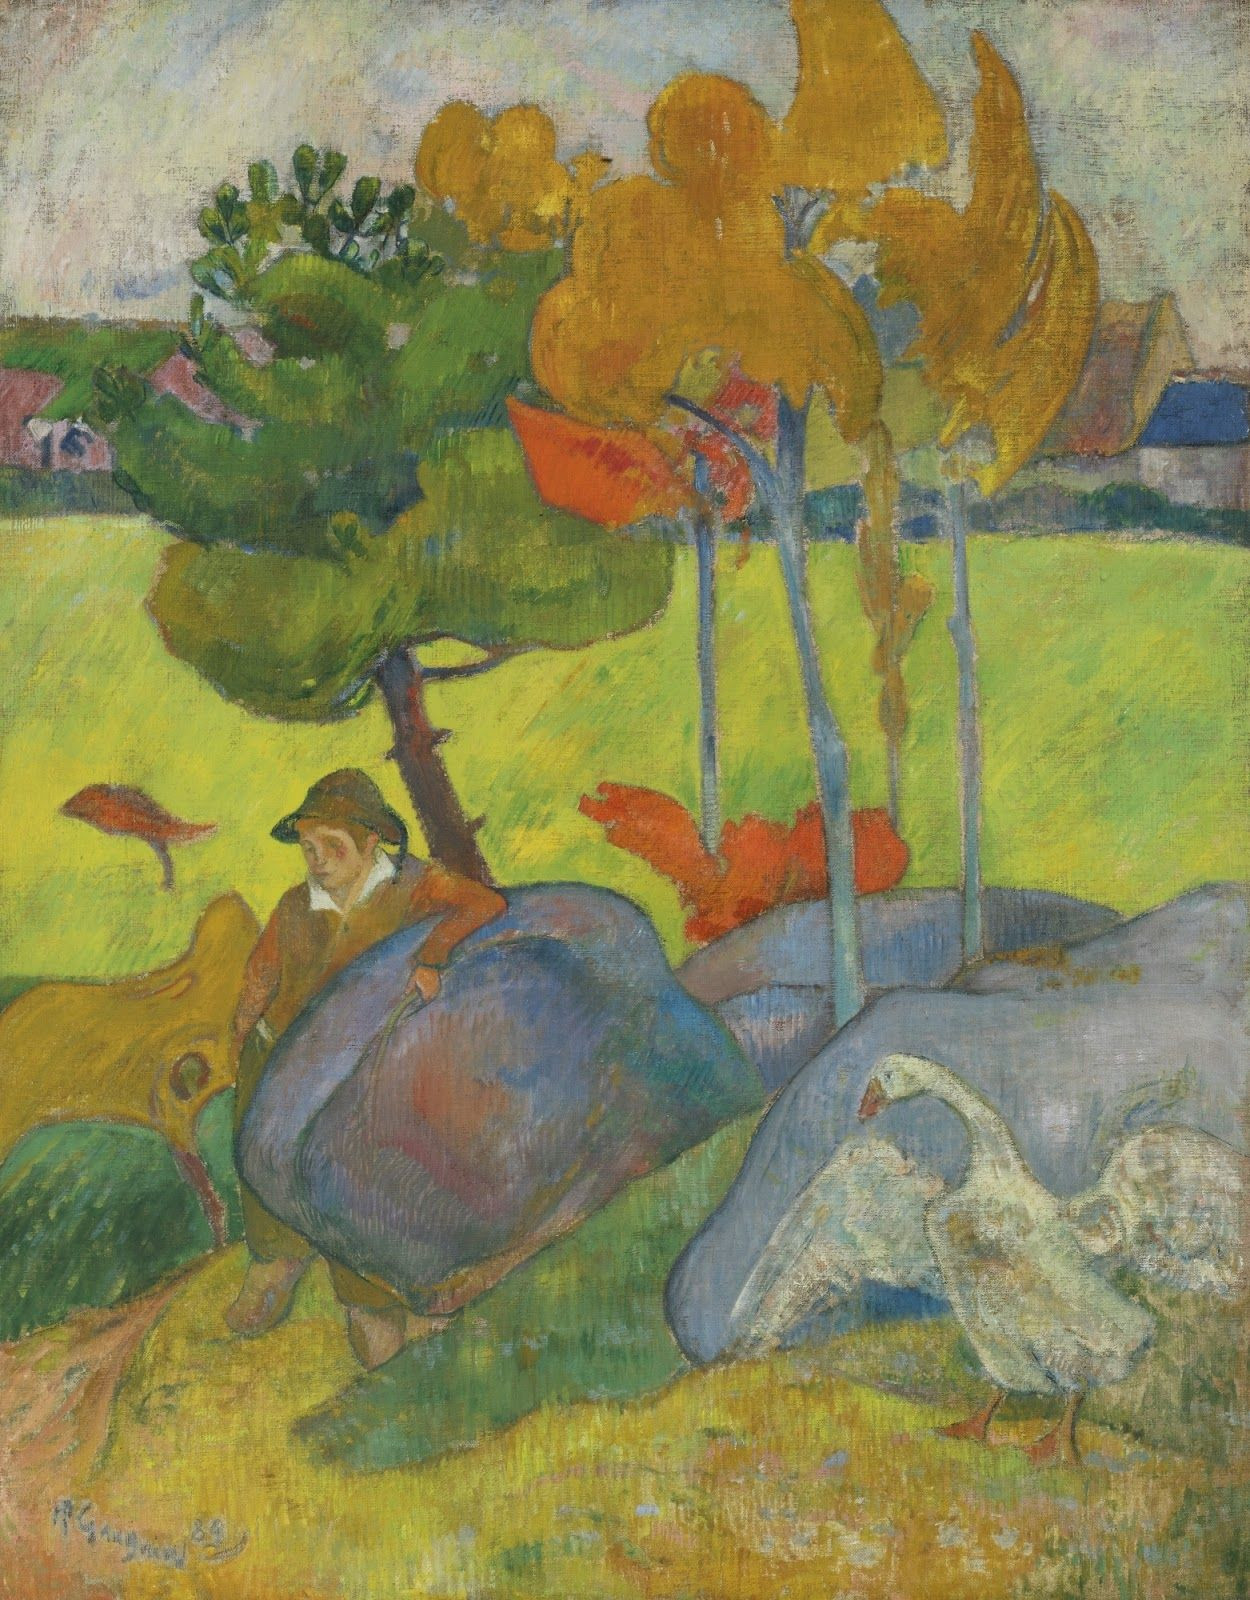 A Vase Of Flowers by Paul Gauguin Of Masterpiece Of Art Paul Gauguin Petit Breton A Loie 1889 Inside Masterpiece Of Art Paul Gauguin Petit Breton A Loie 1889